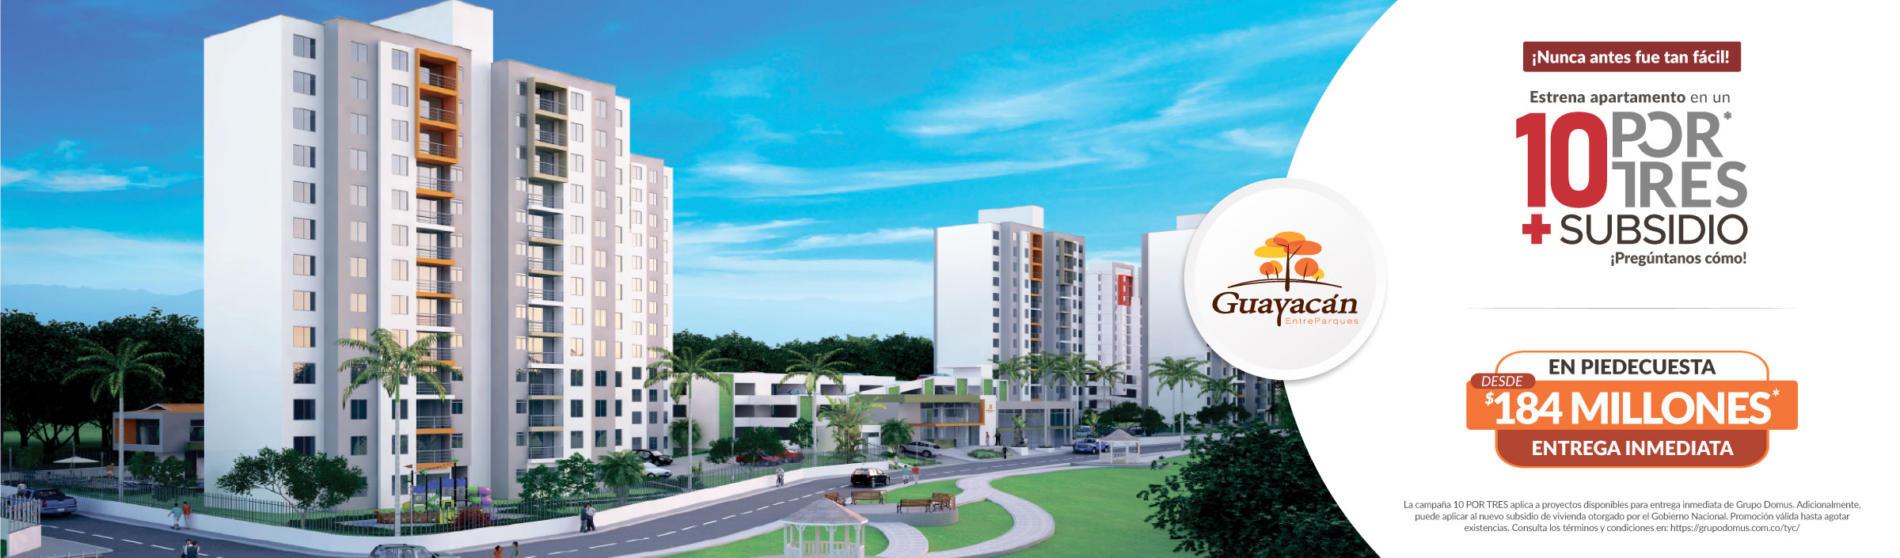 G-Domus-apartamentos-piedecuesta-guayacan-subsidio-10portres